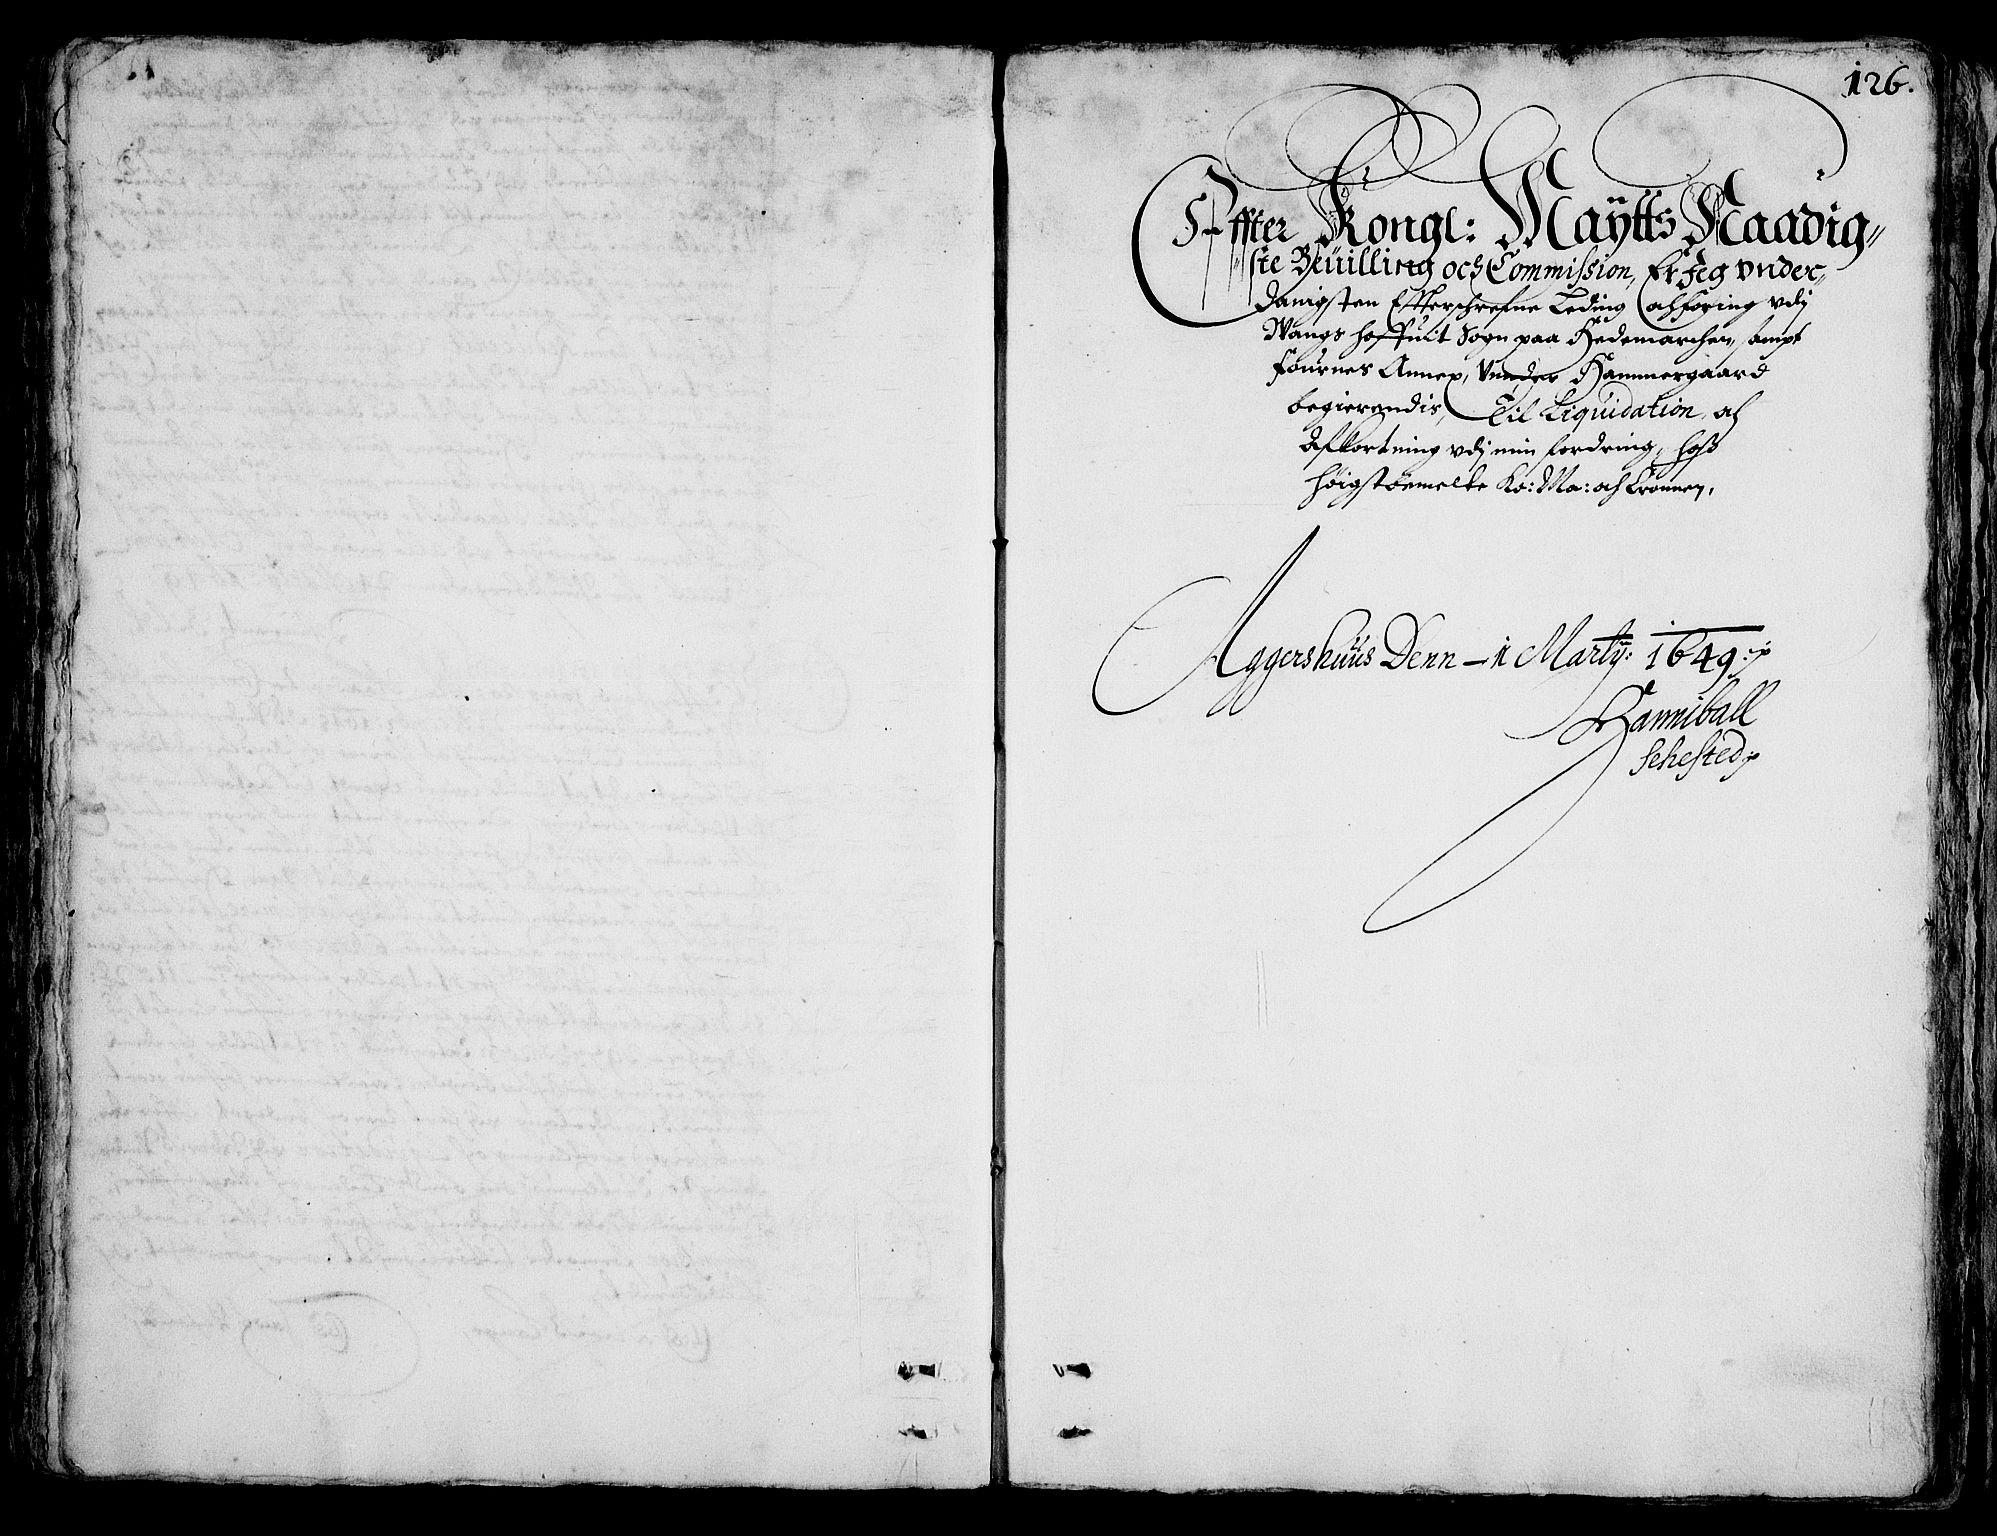 RA, Rentekammeret inntil 1814, Realistisk ordnet avdeling, On/L0001: Statens gods, 1651, s. 125b-126a